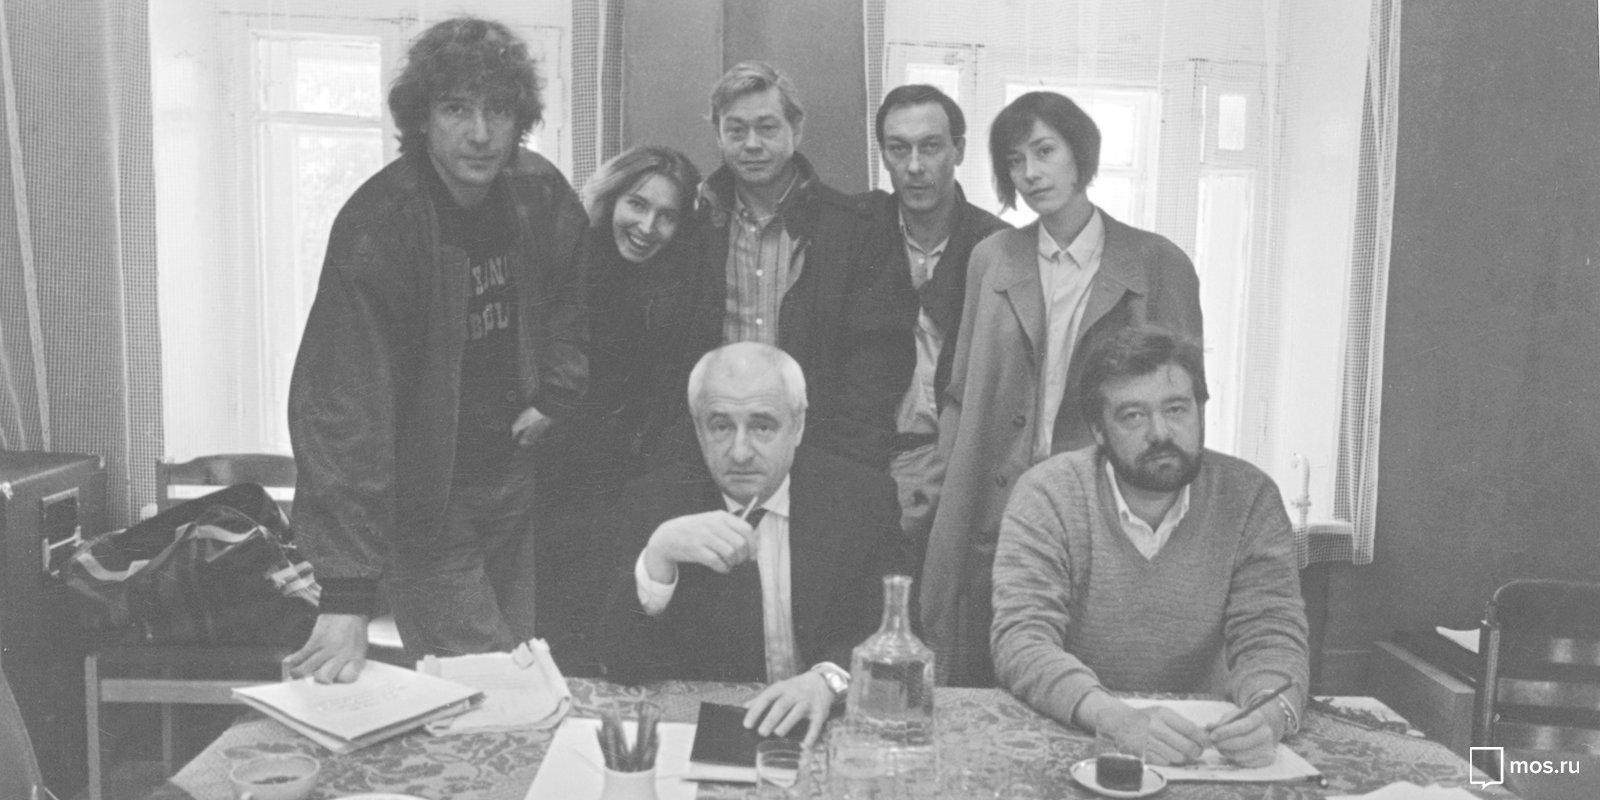 Count Rezanov and Billy King: Our memories of Nikolai